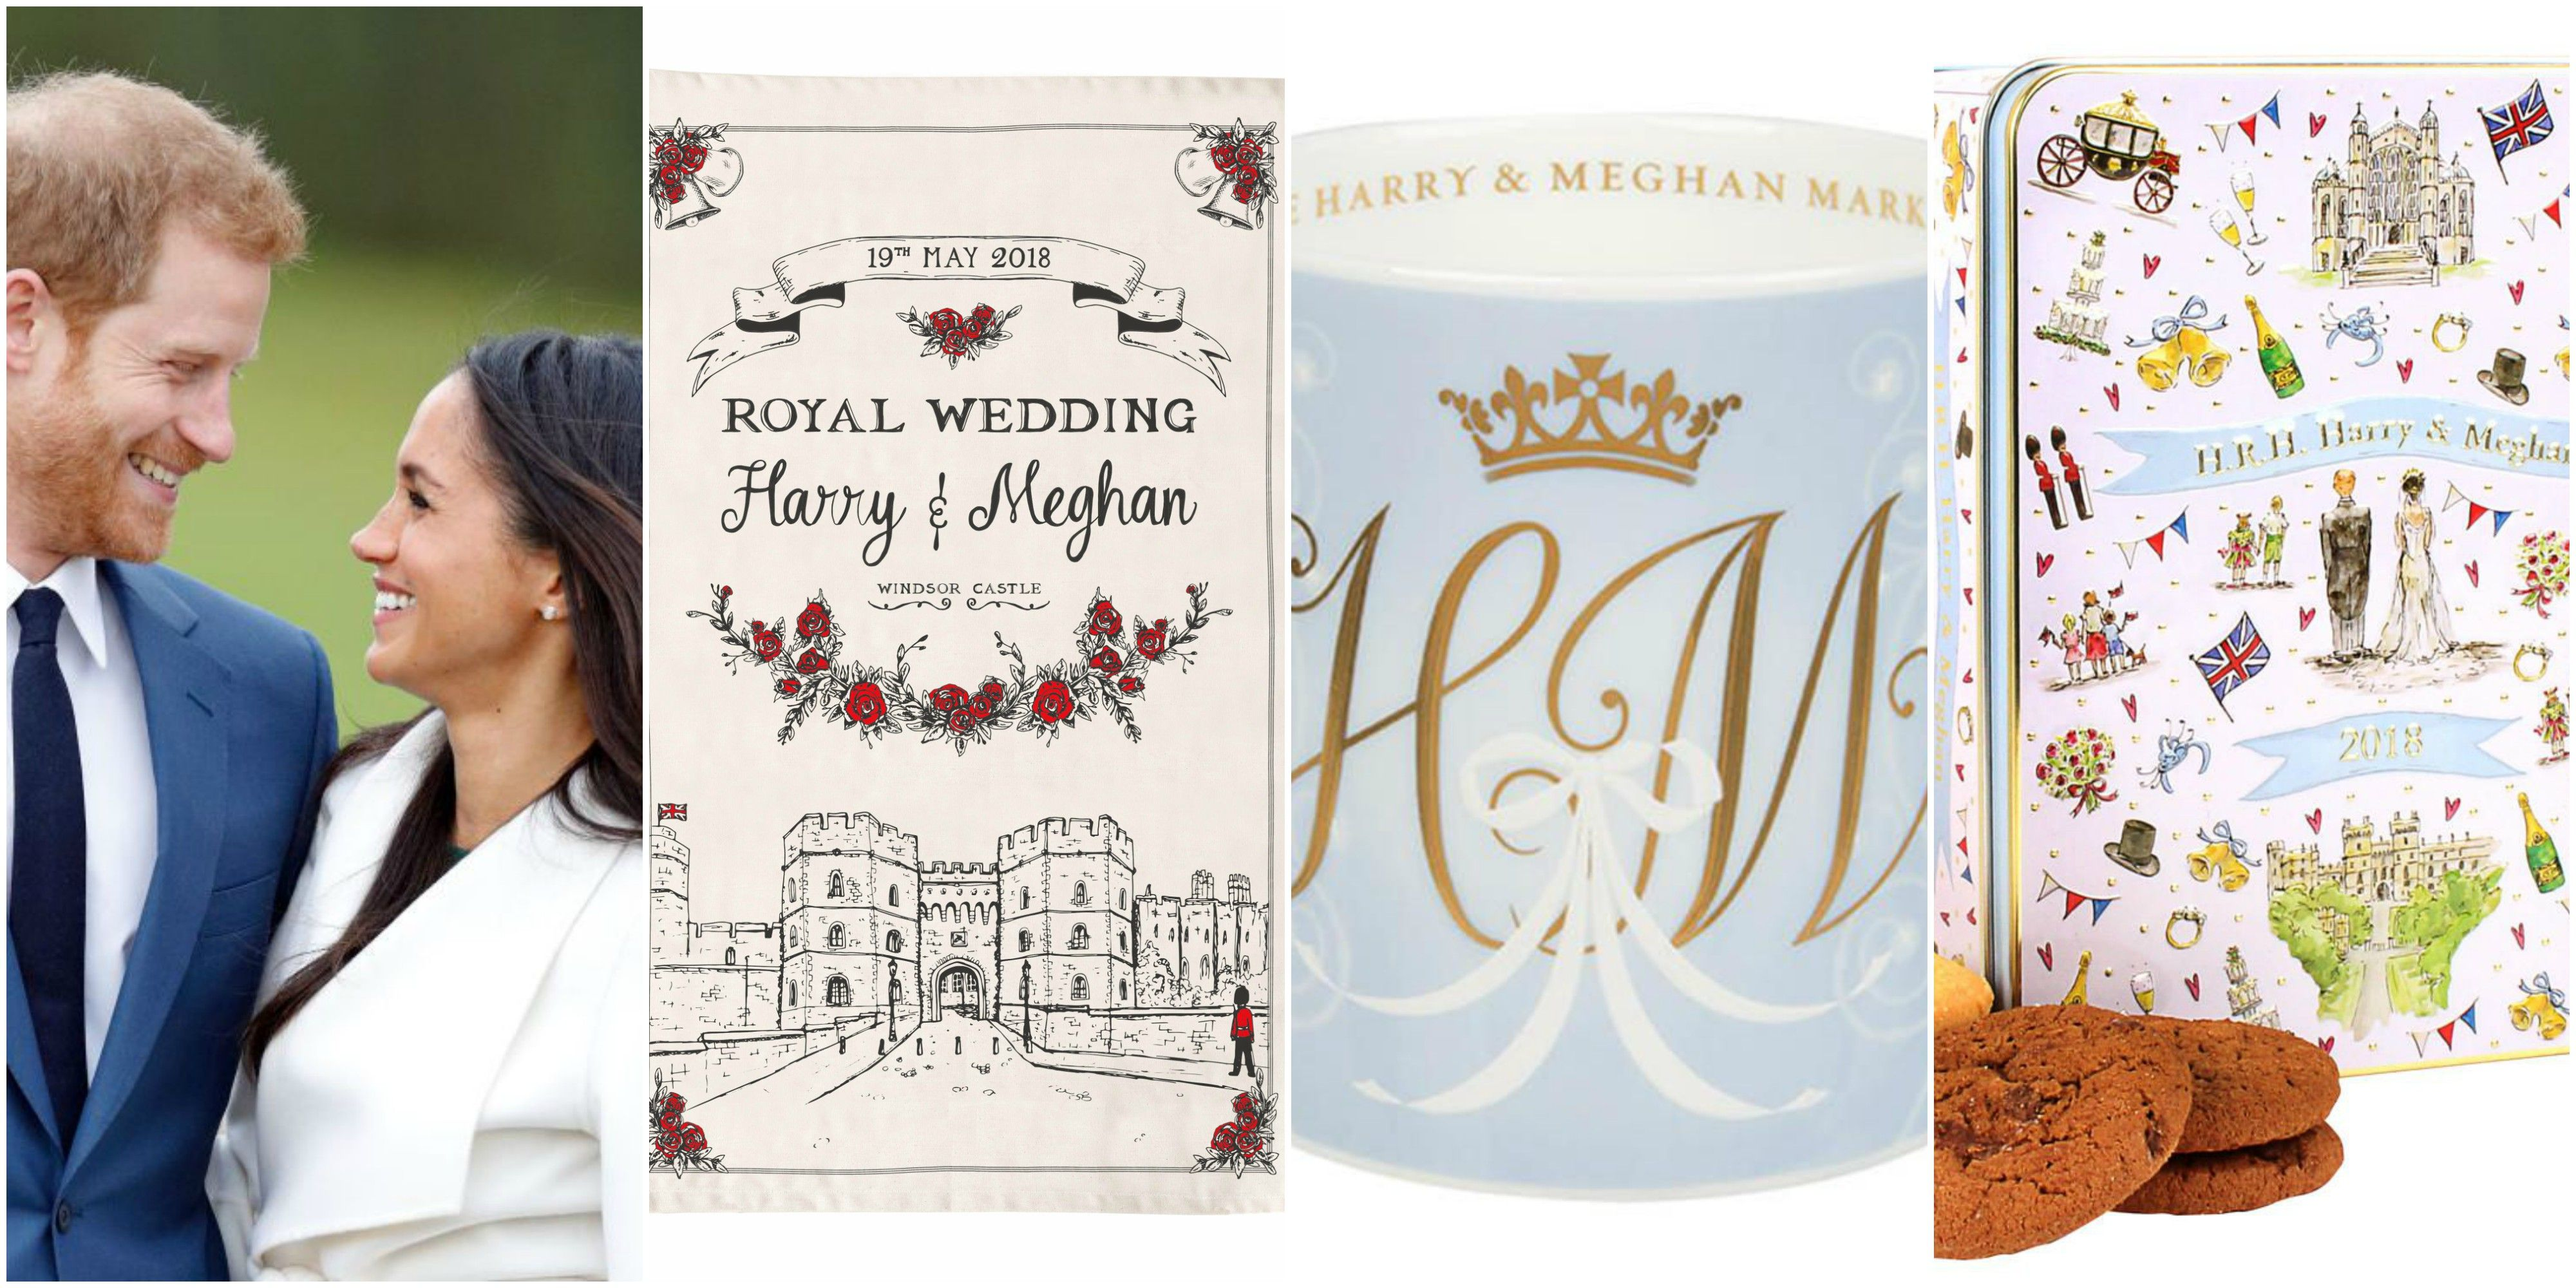 The Best Royal Wedding Memorabilia So Far